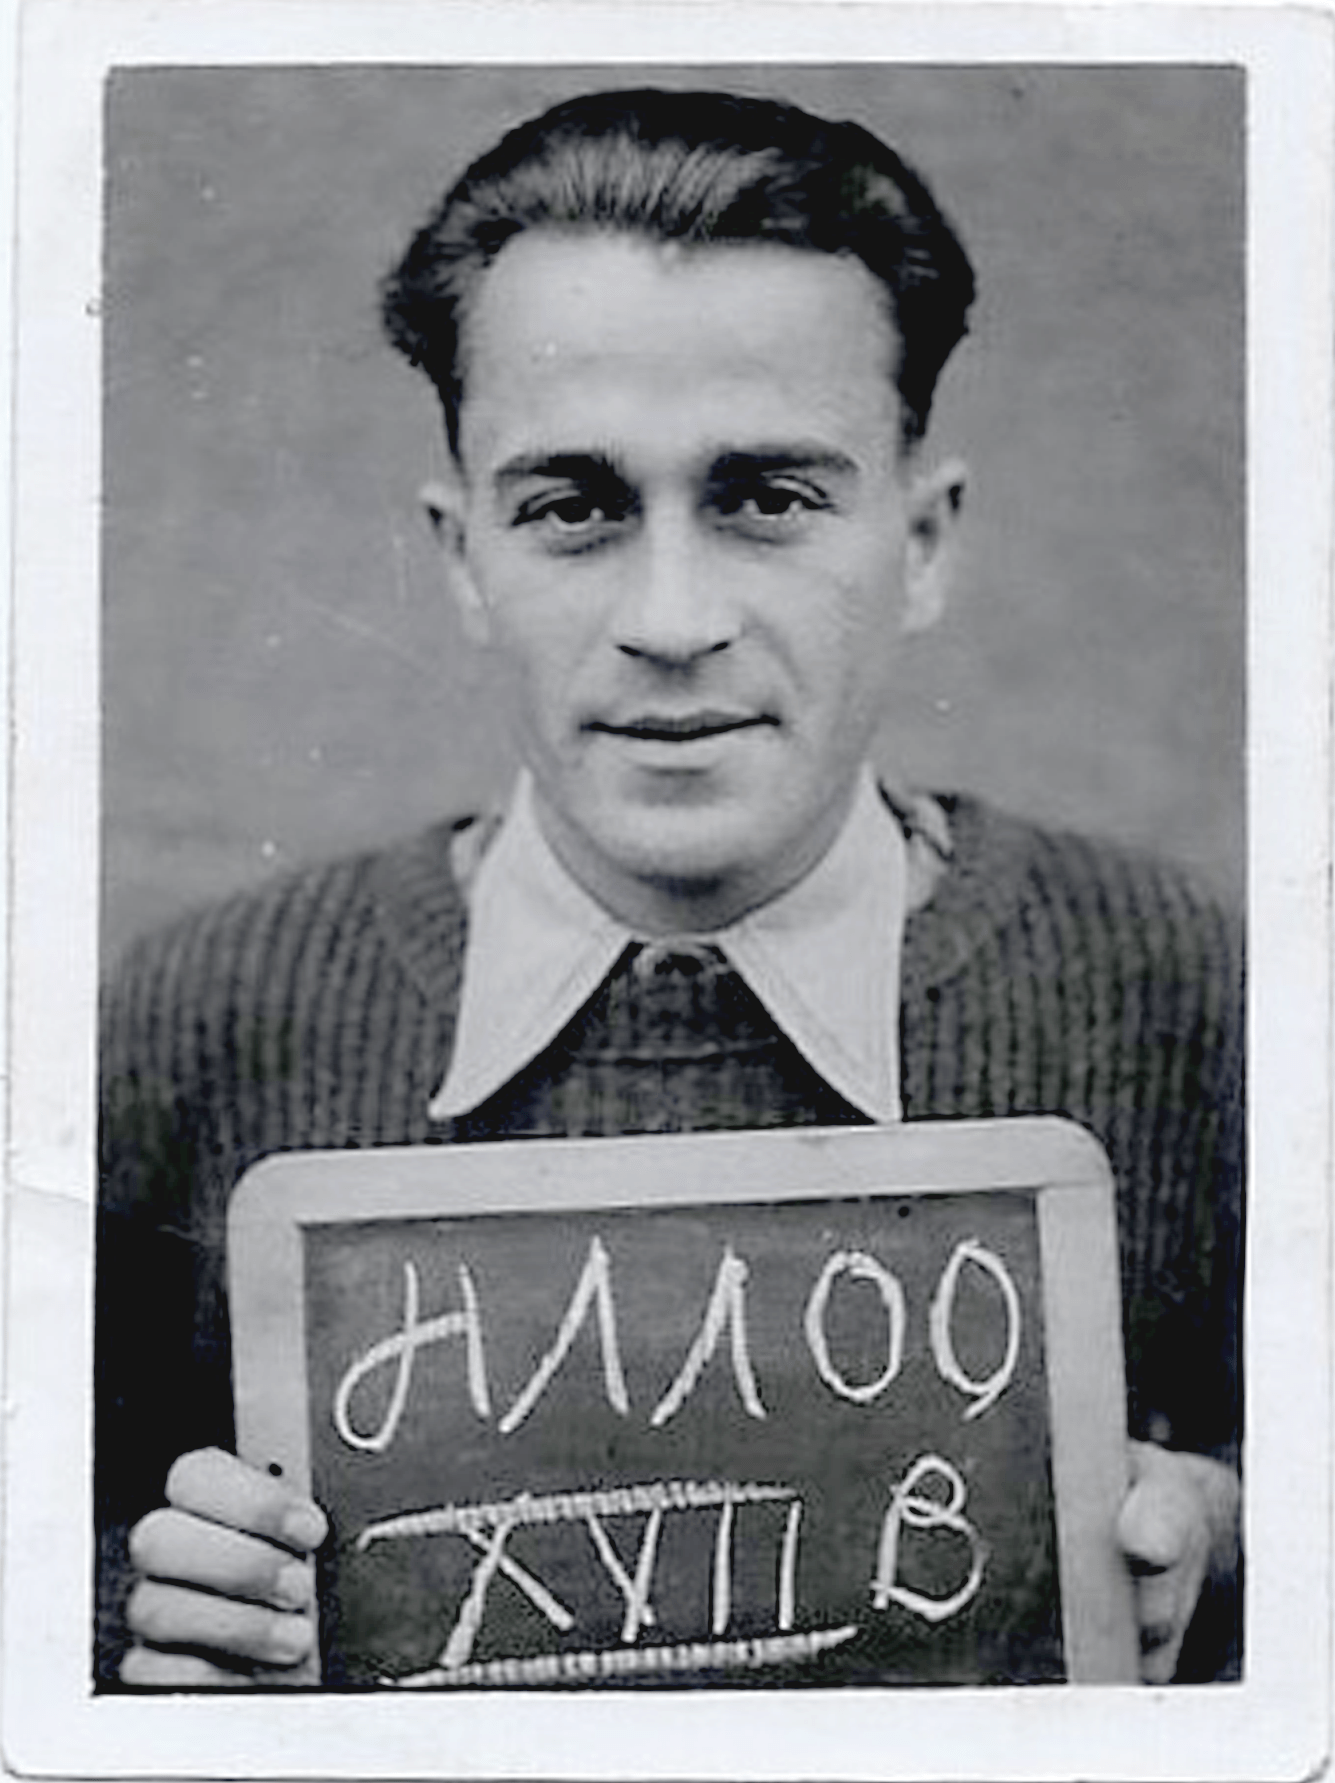 Marcel LEULIER